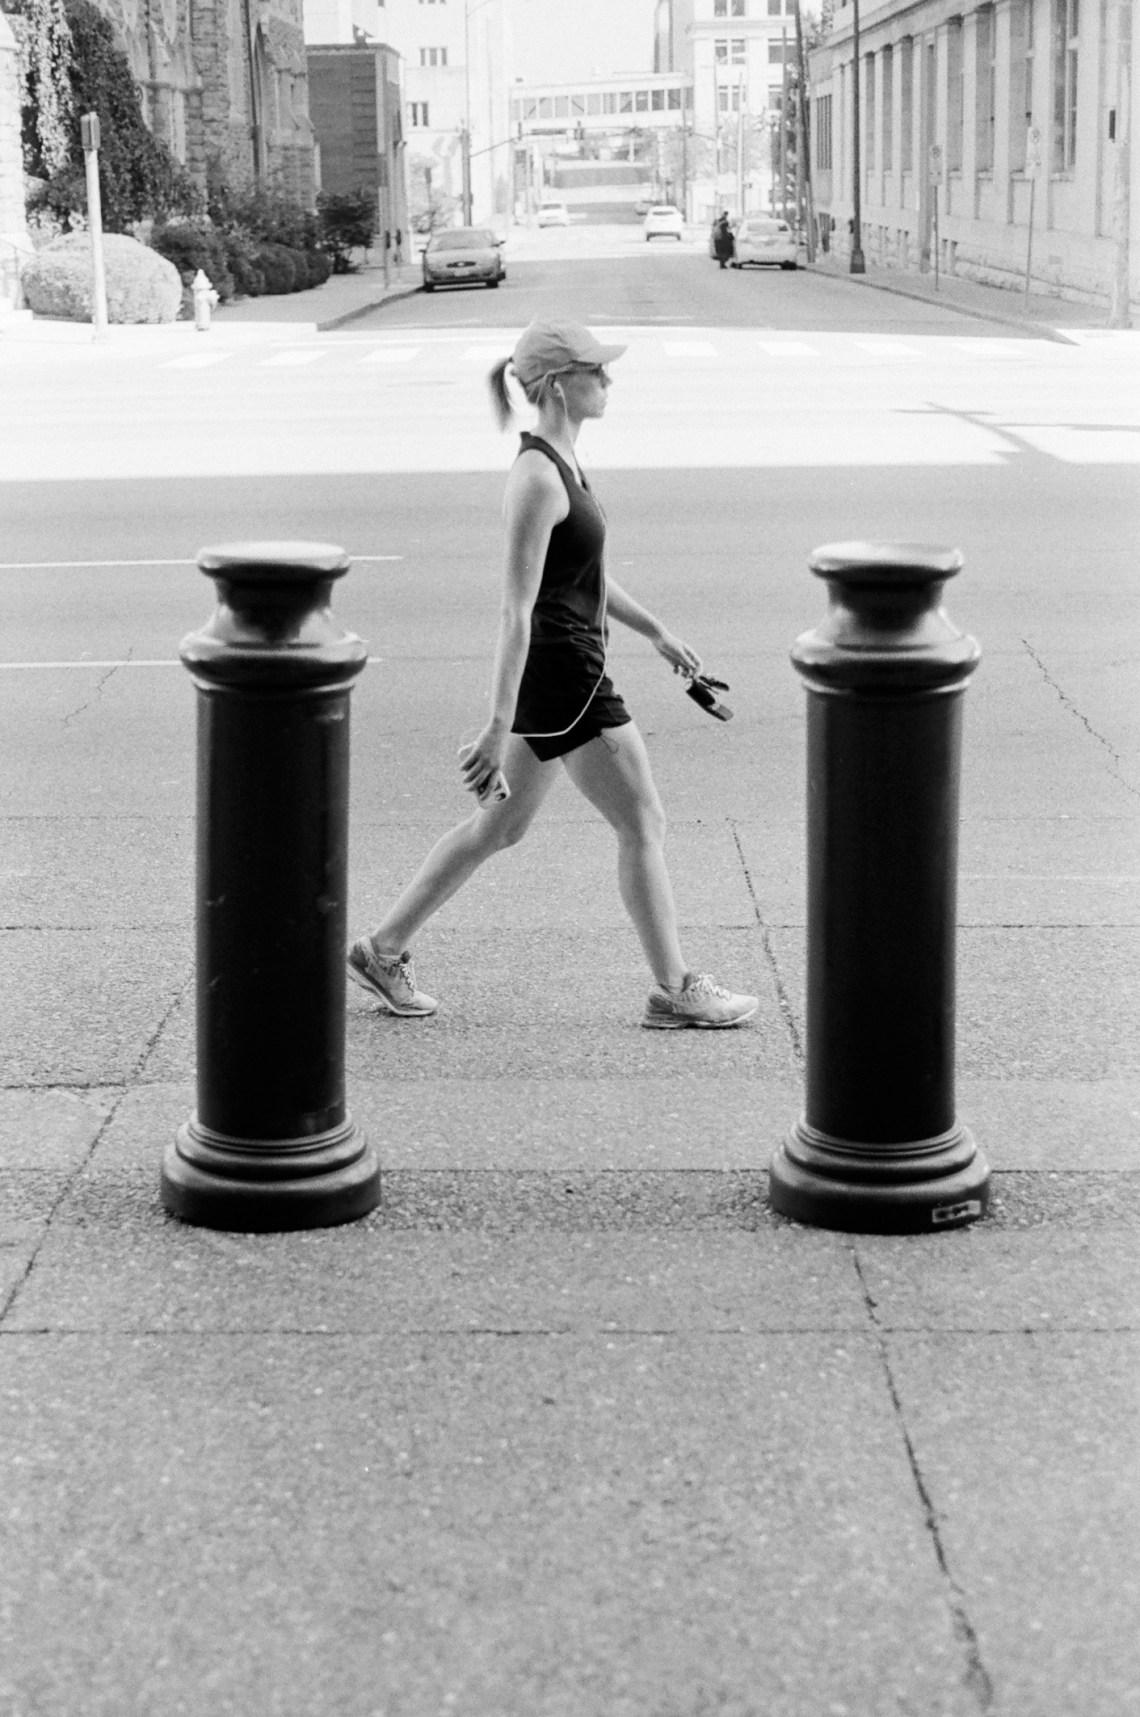 Downtown Nashville - Olympus OM1 / 50mm f1.8 / Kodak TRI-X 400 / FINDLab